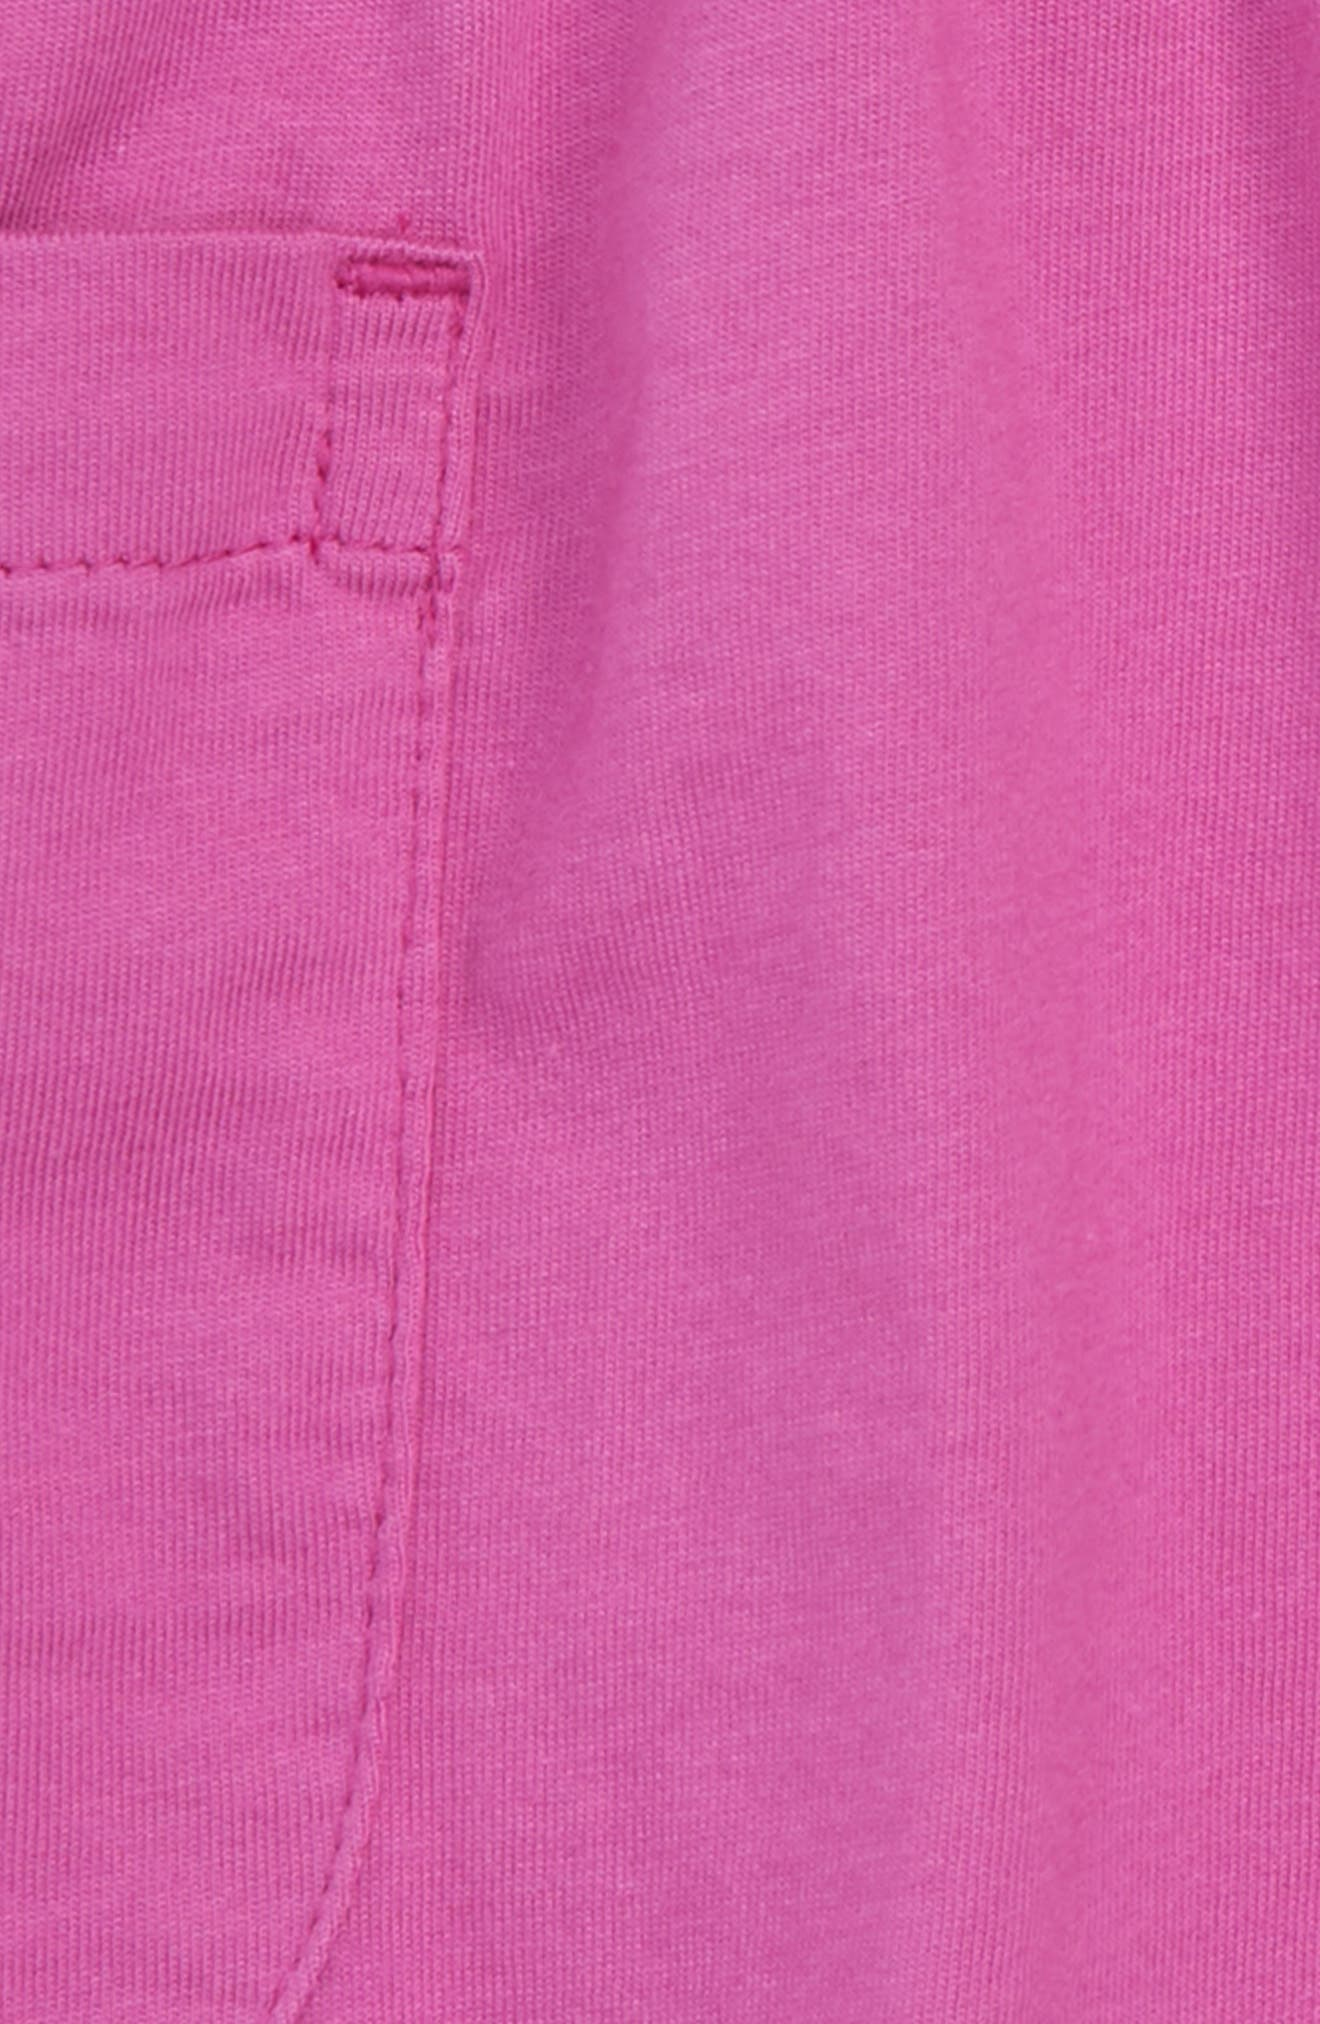 Easy Pocket Shorts,                             Alternate thumbnail 2, color,                             671